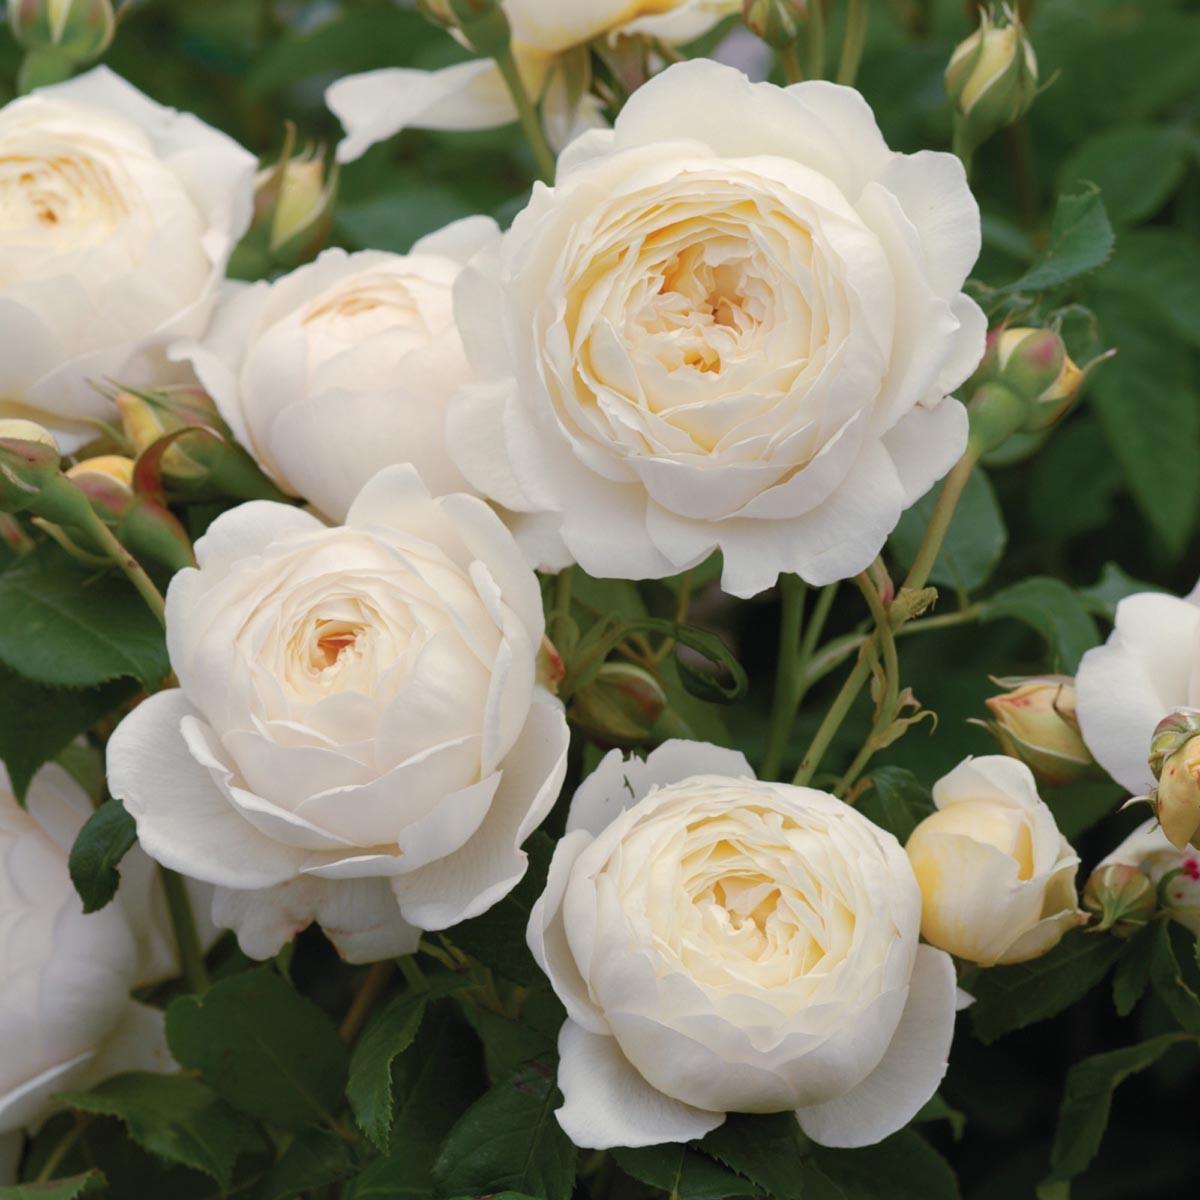 'Claire Austin' rose. Photo credit: davidaustinroses.com